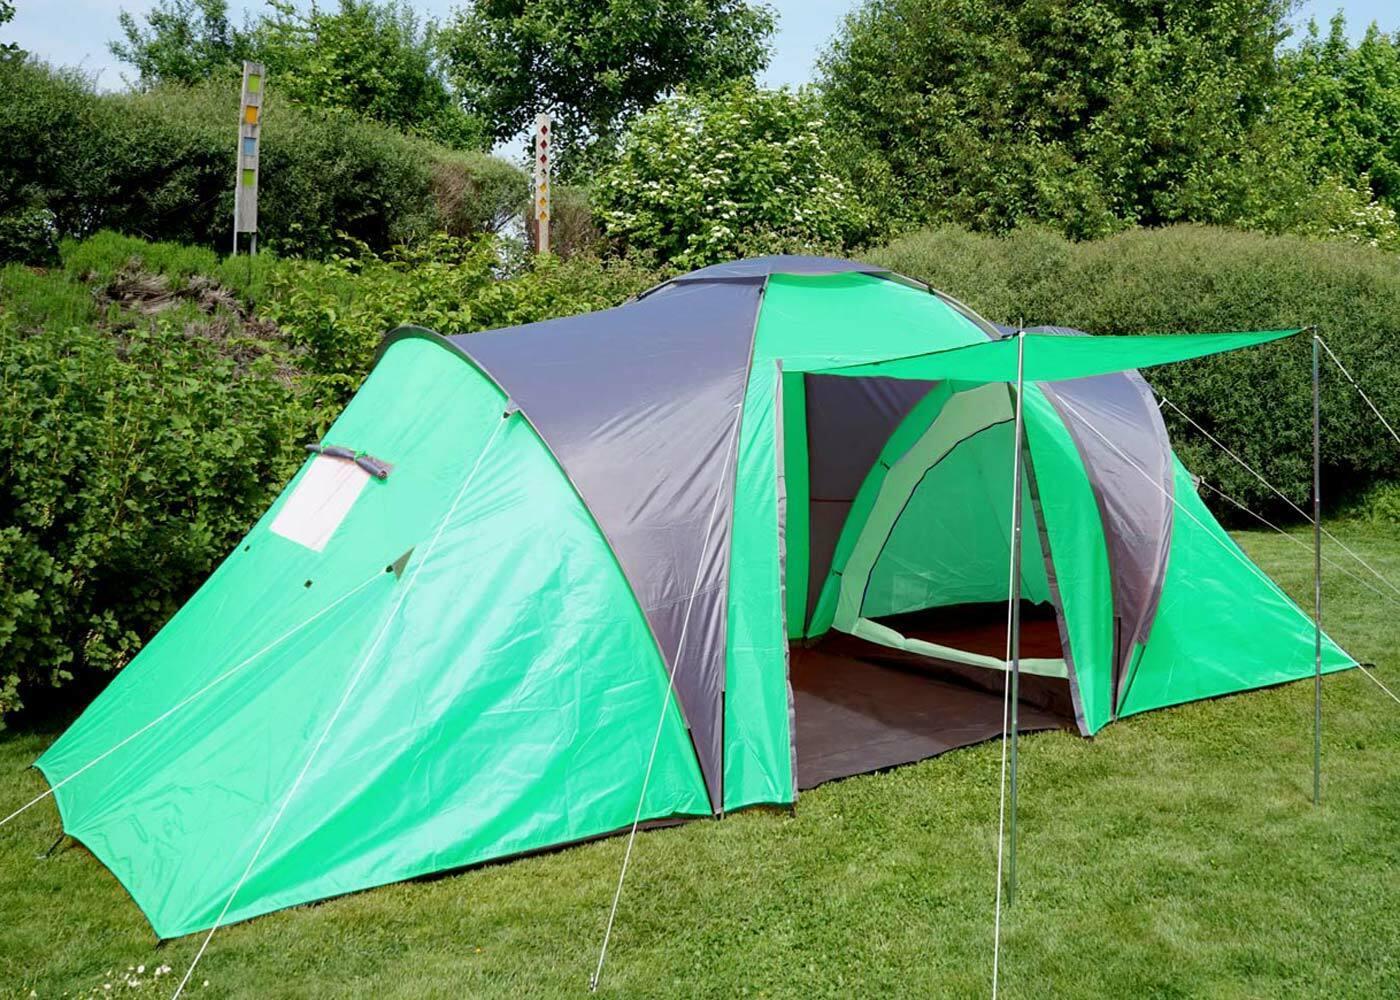 Tenda da da da campeggio Loksa, 4uomo Cupola Tenda Igloo Tenda FestivalTenda, 4 persone verde afa471